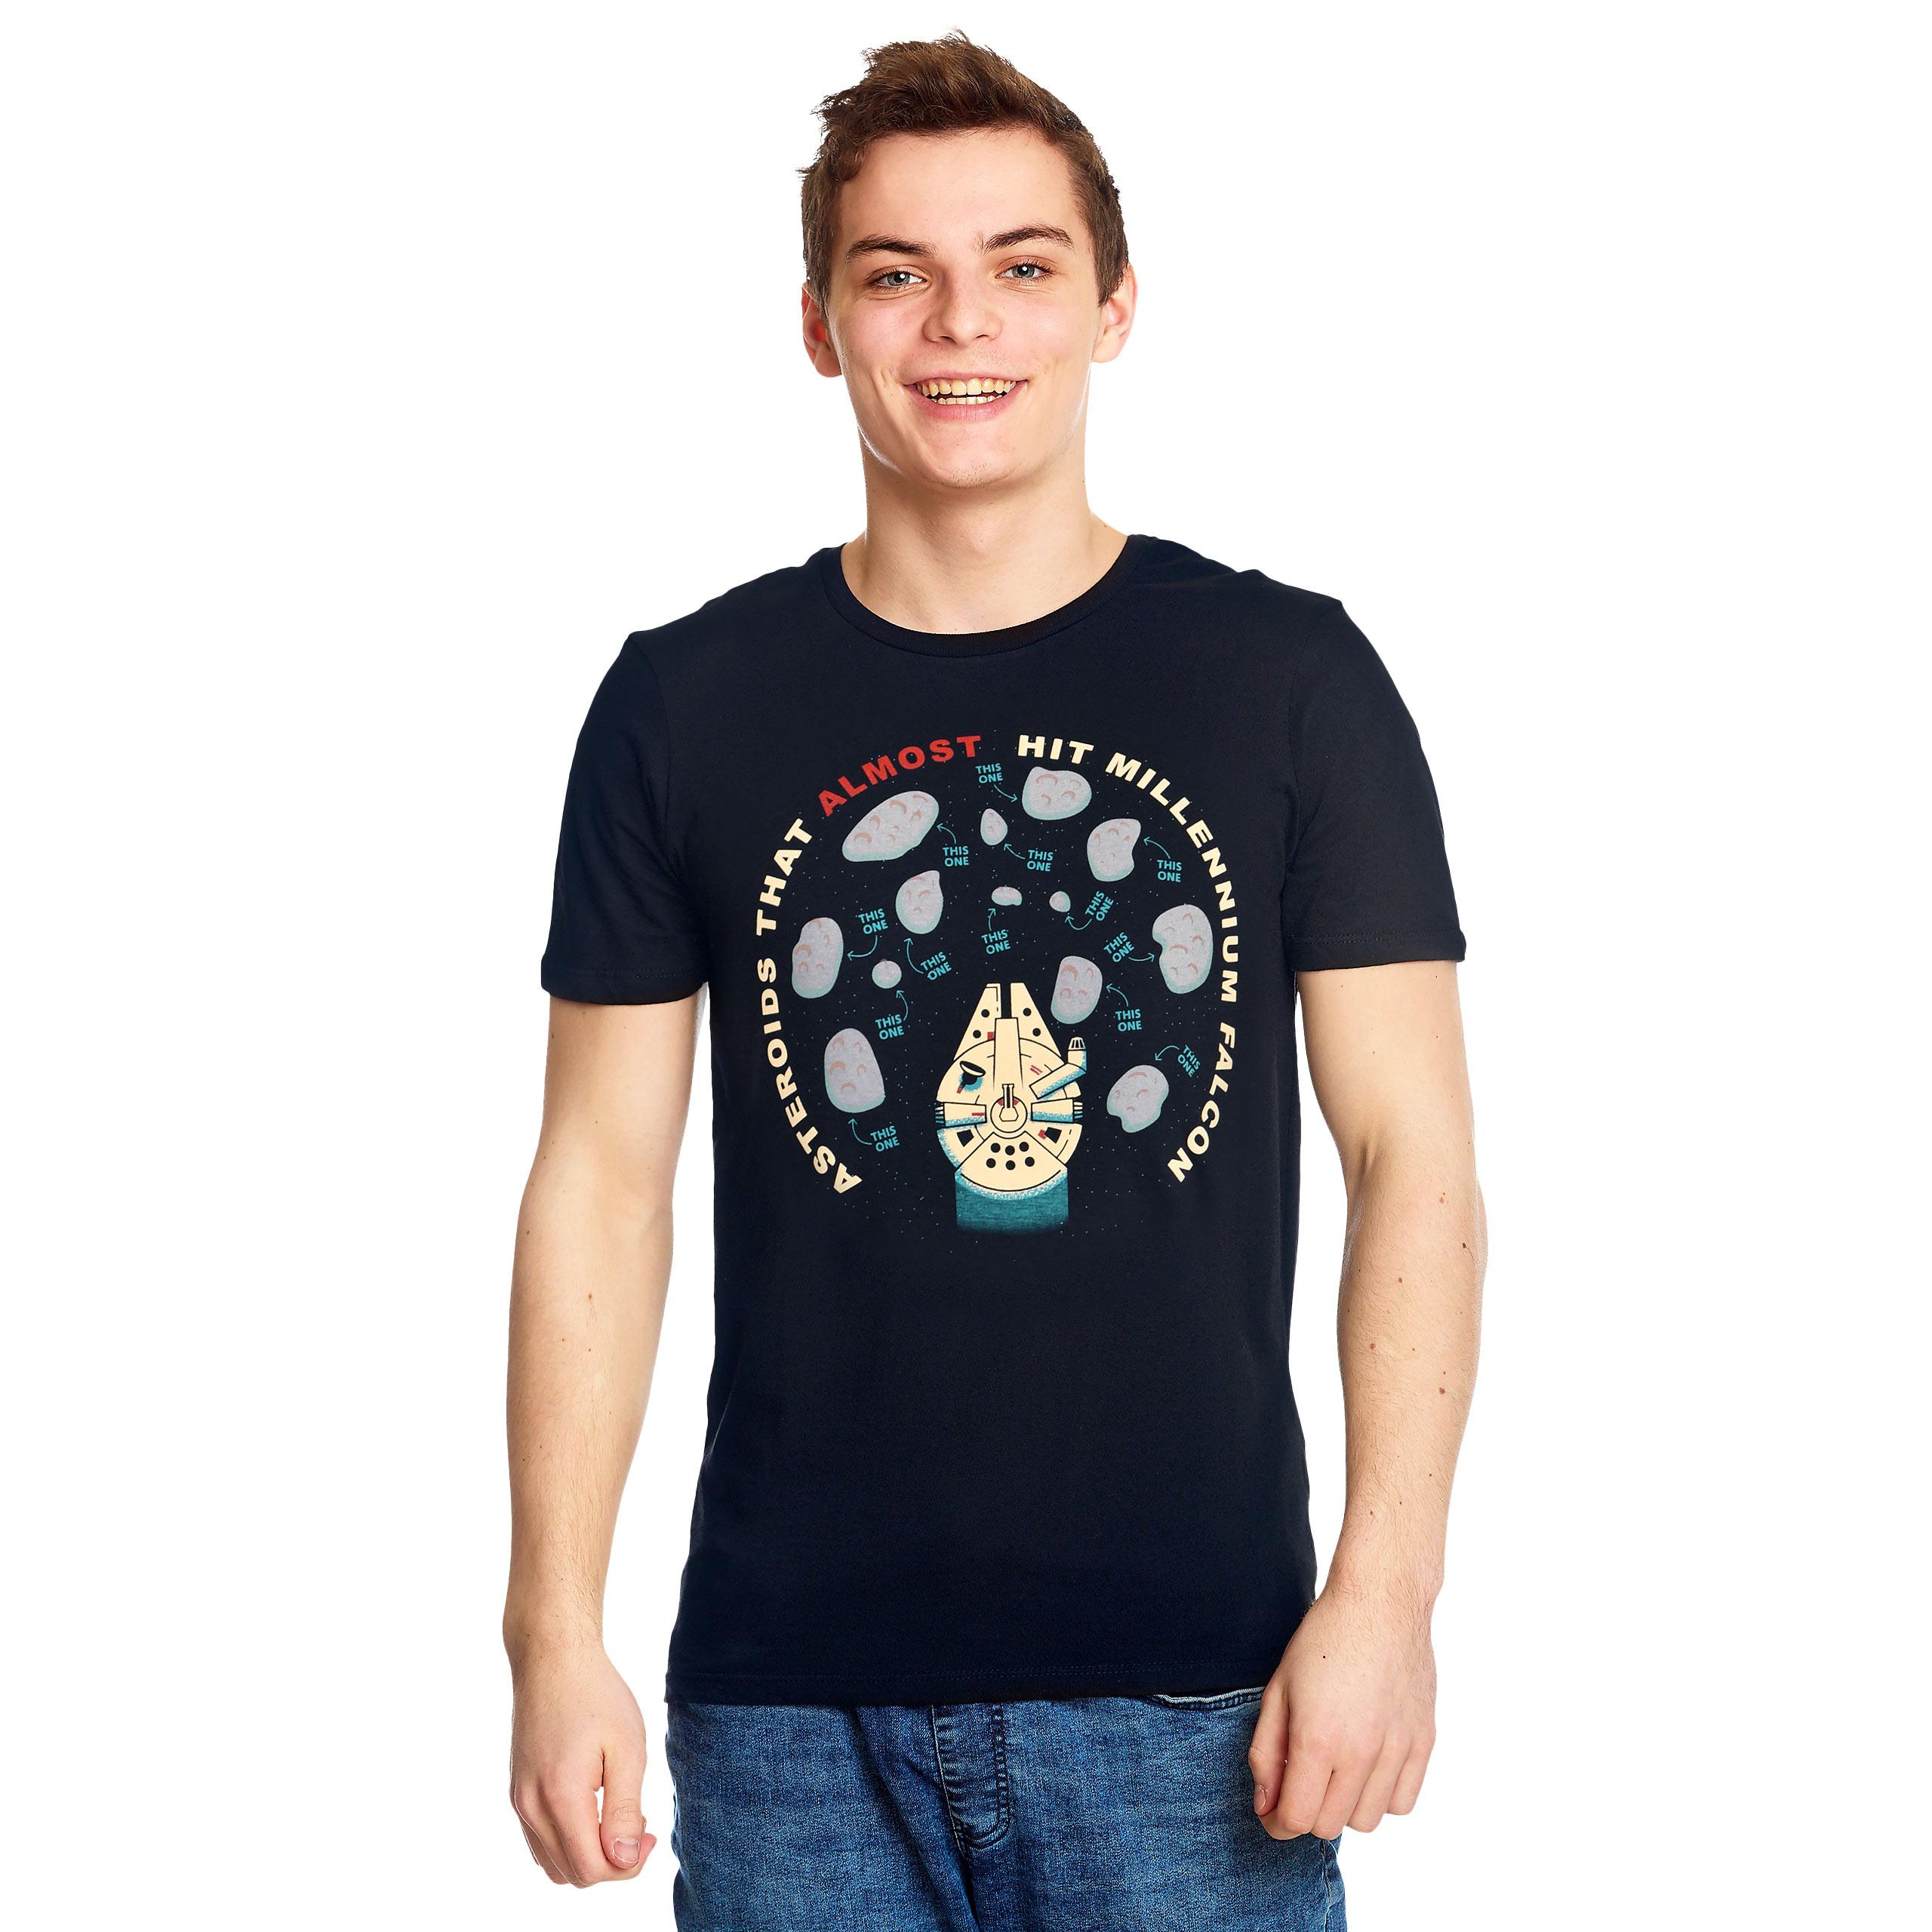 Star Wars - Asteroids That Almost Hit Millennium Falcon T-Shirt blau